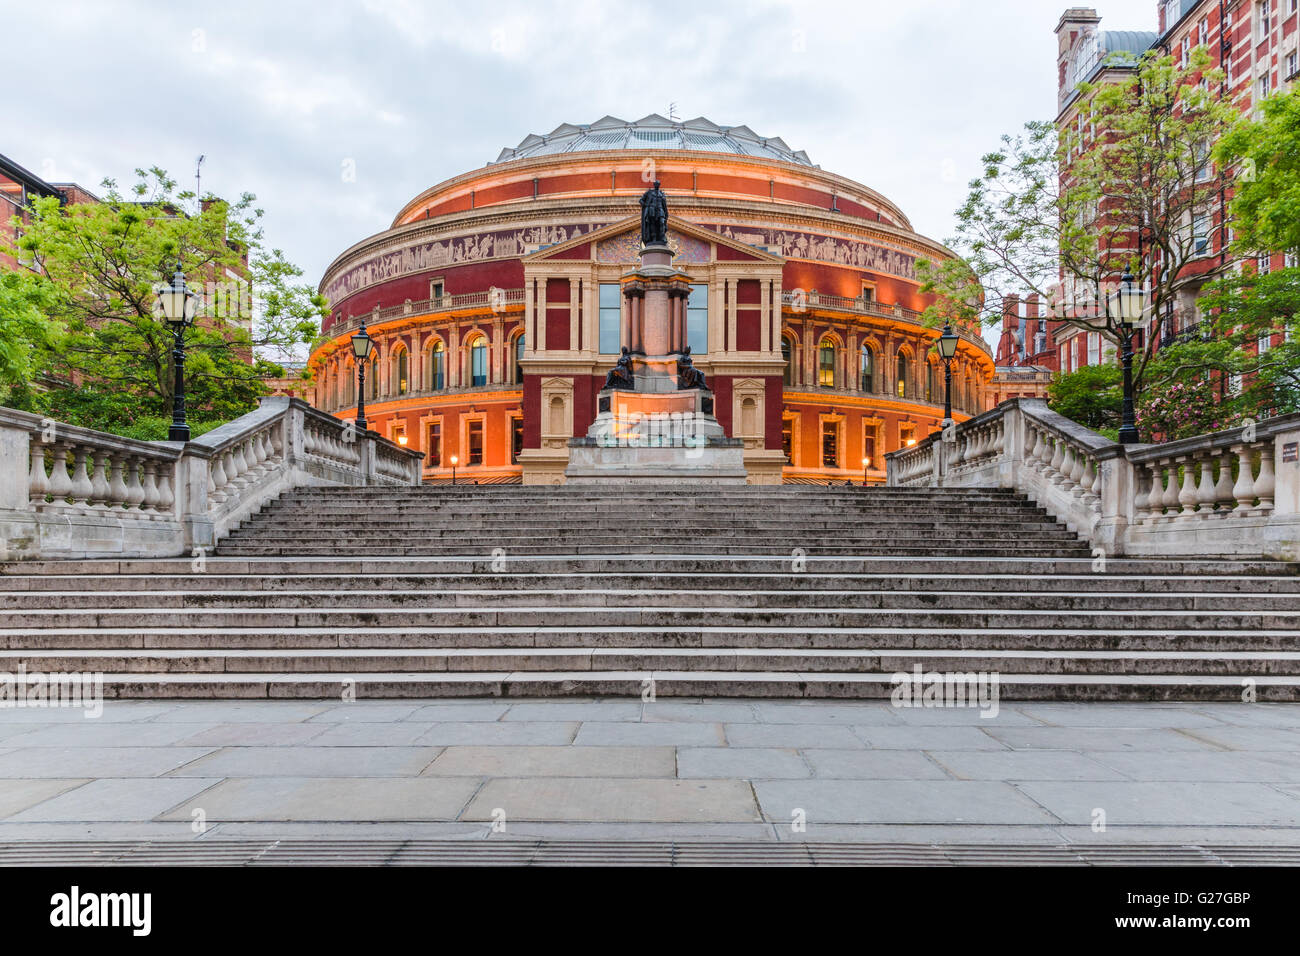 Royal Albert Hall, Londres, Inglaterra, Reino Unido. Imagen De Stock